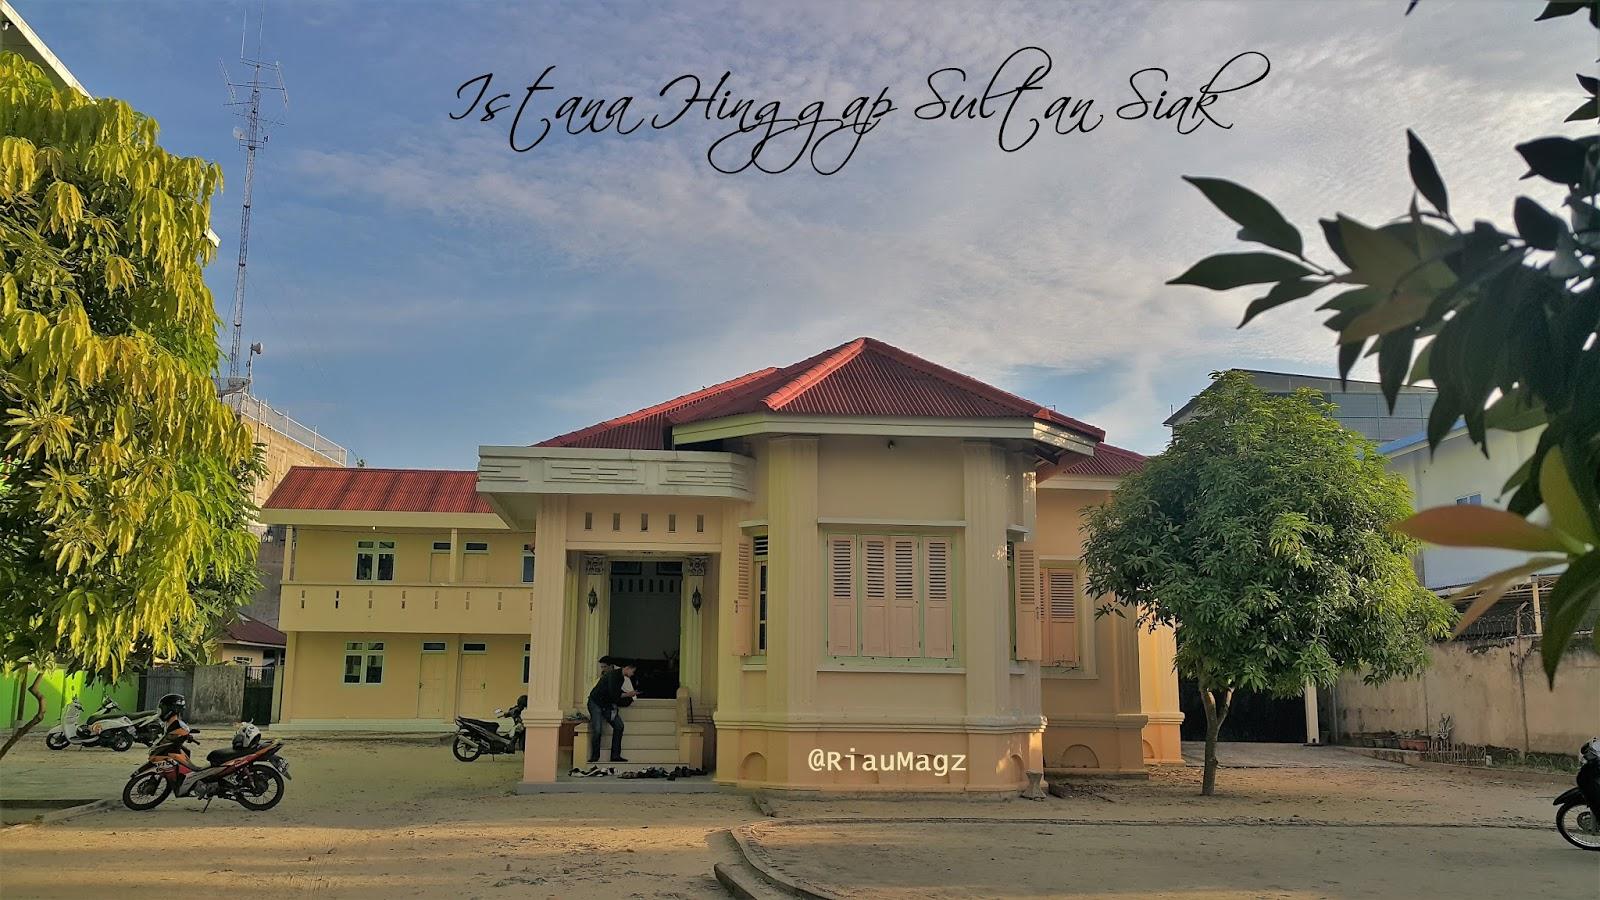 Sejarah Istana Hinggap Sultan Siak Pekanbaru Riau Magazine Rumah Singgah